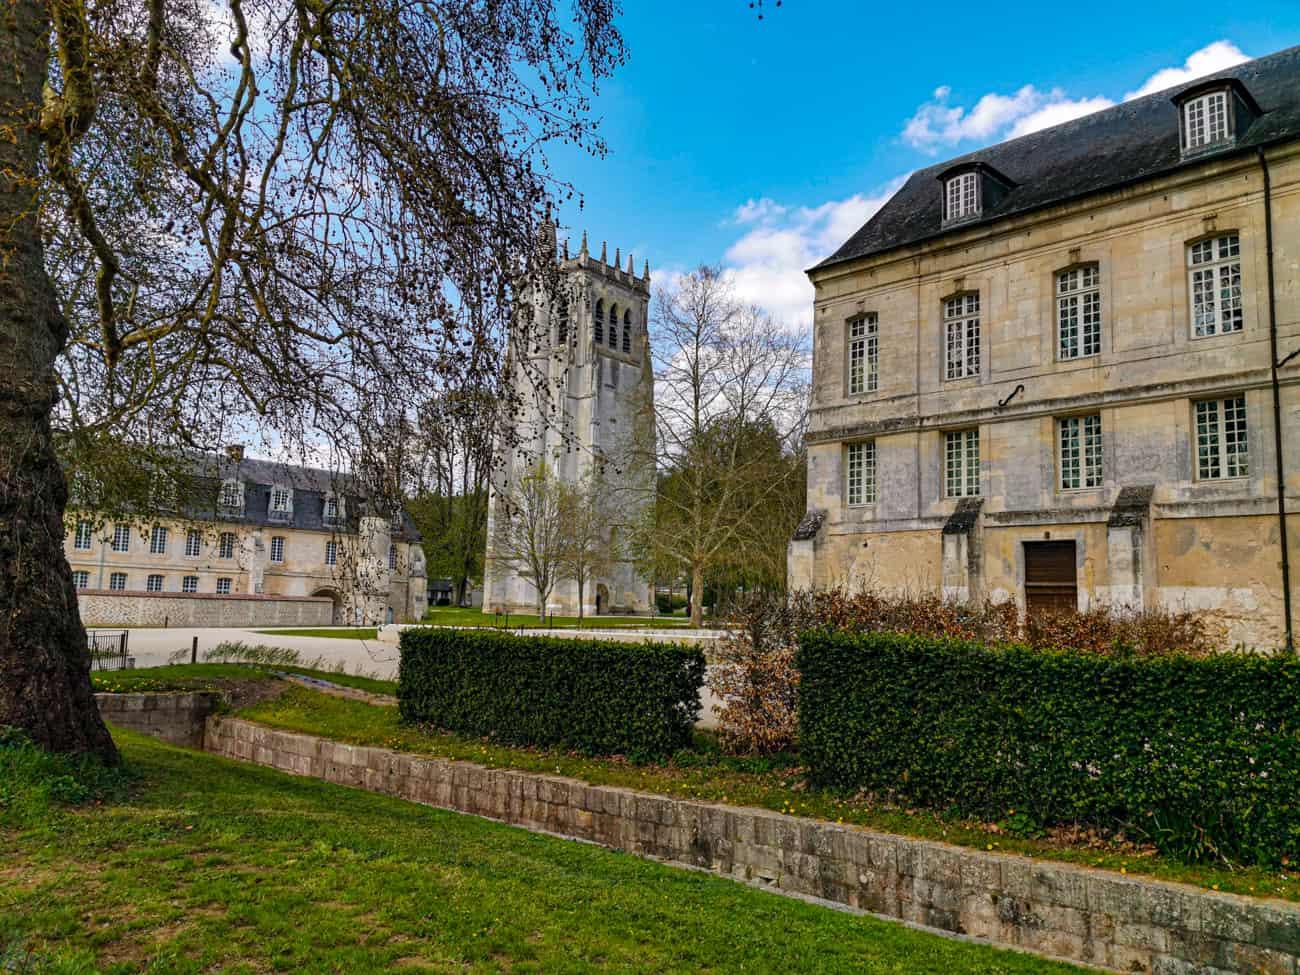 abbaye-bec-hellouin-village-11